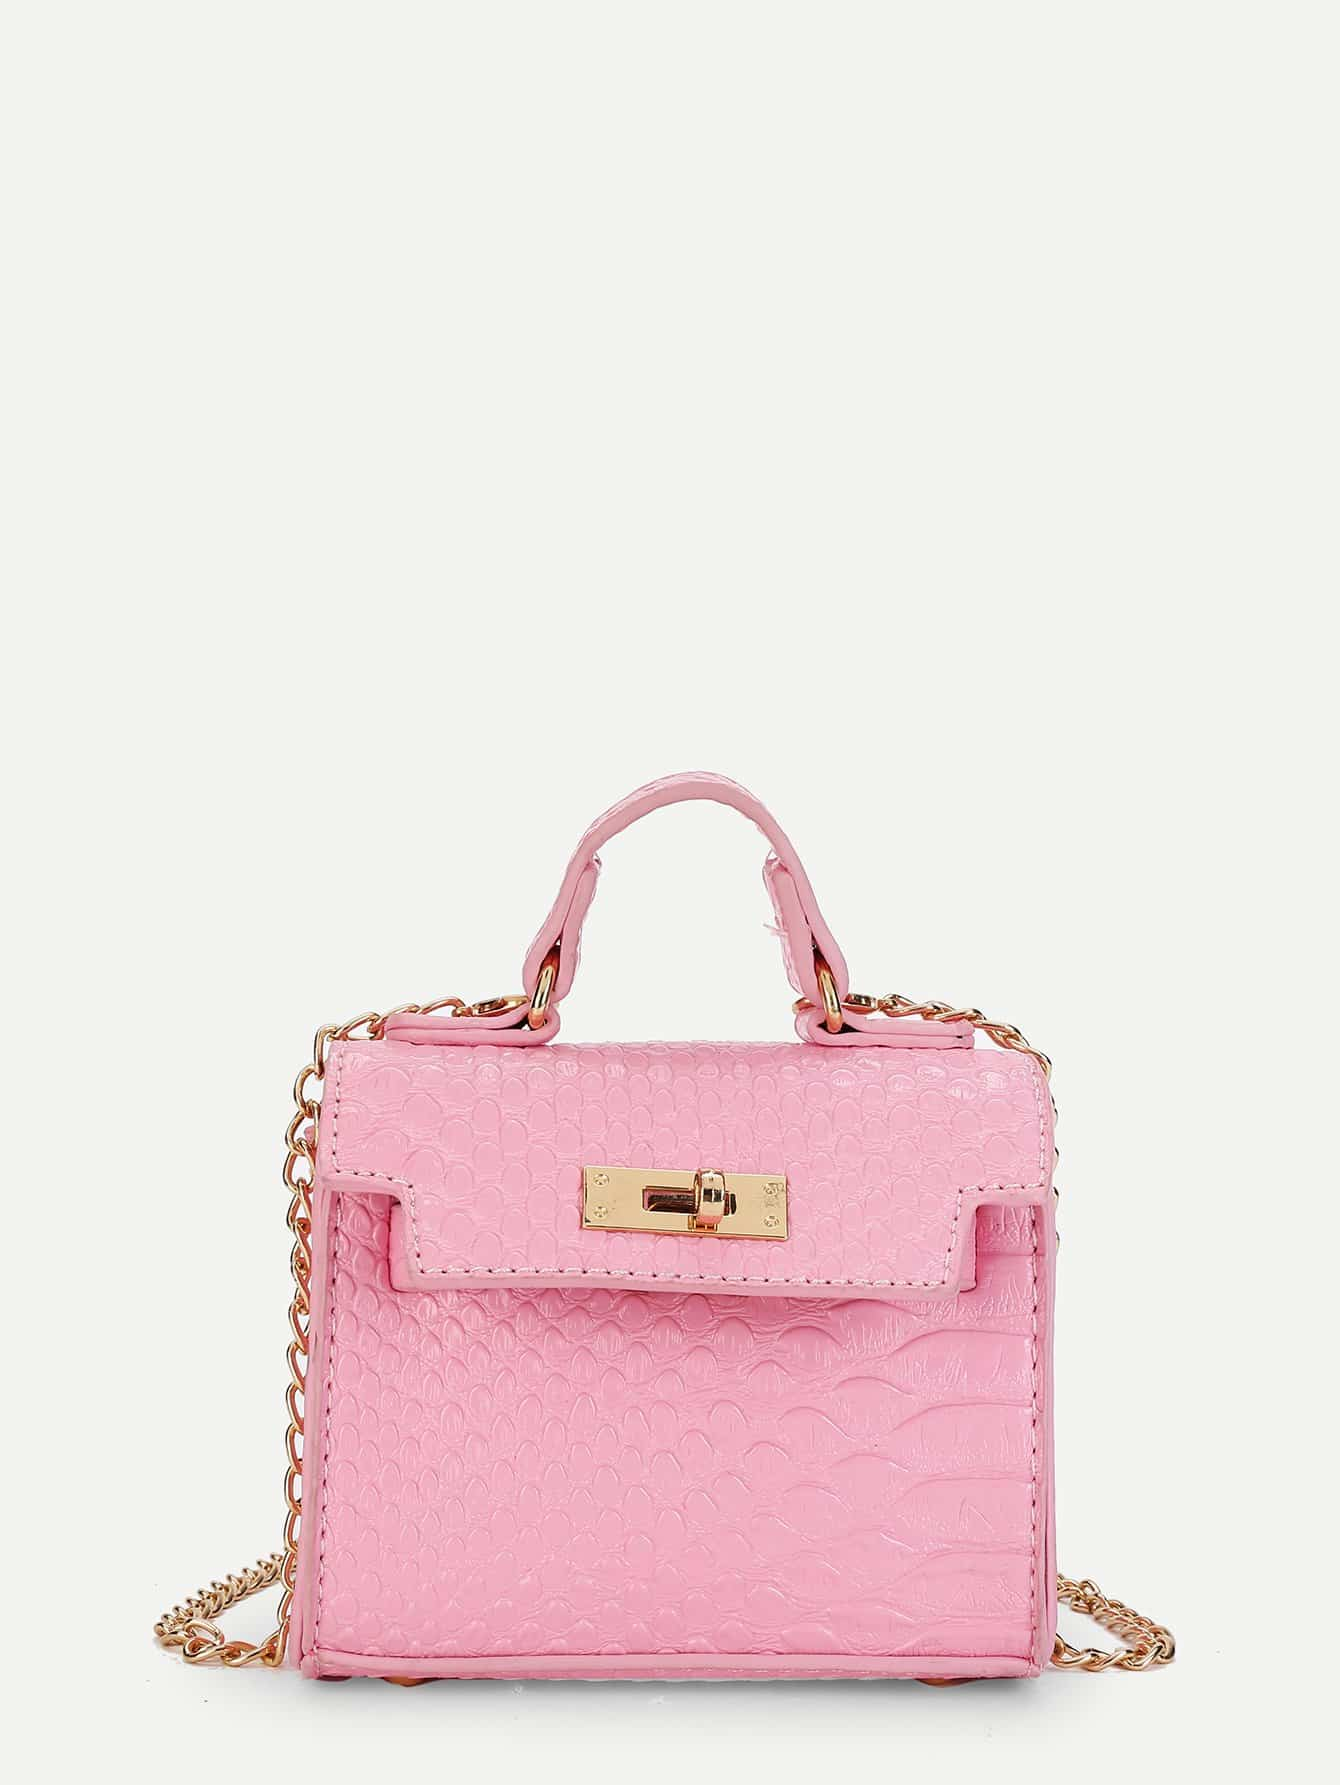 Girls Twist Lock Chain Crossbody Bag